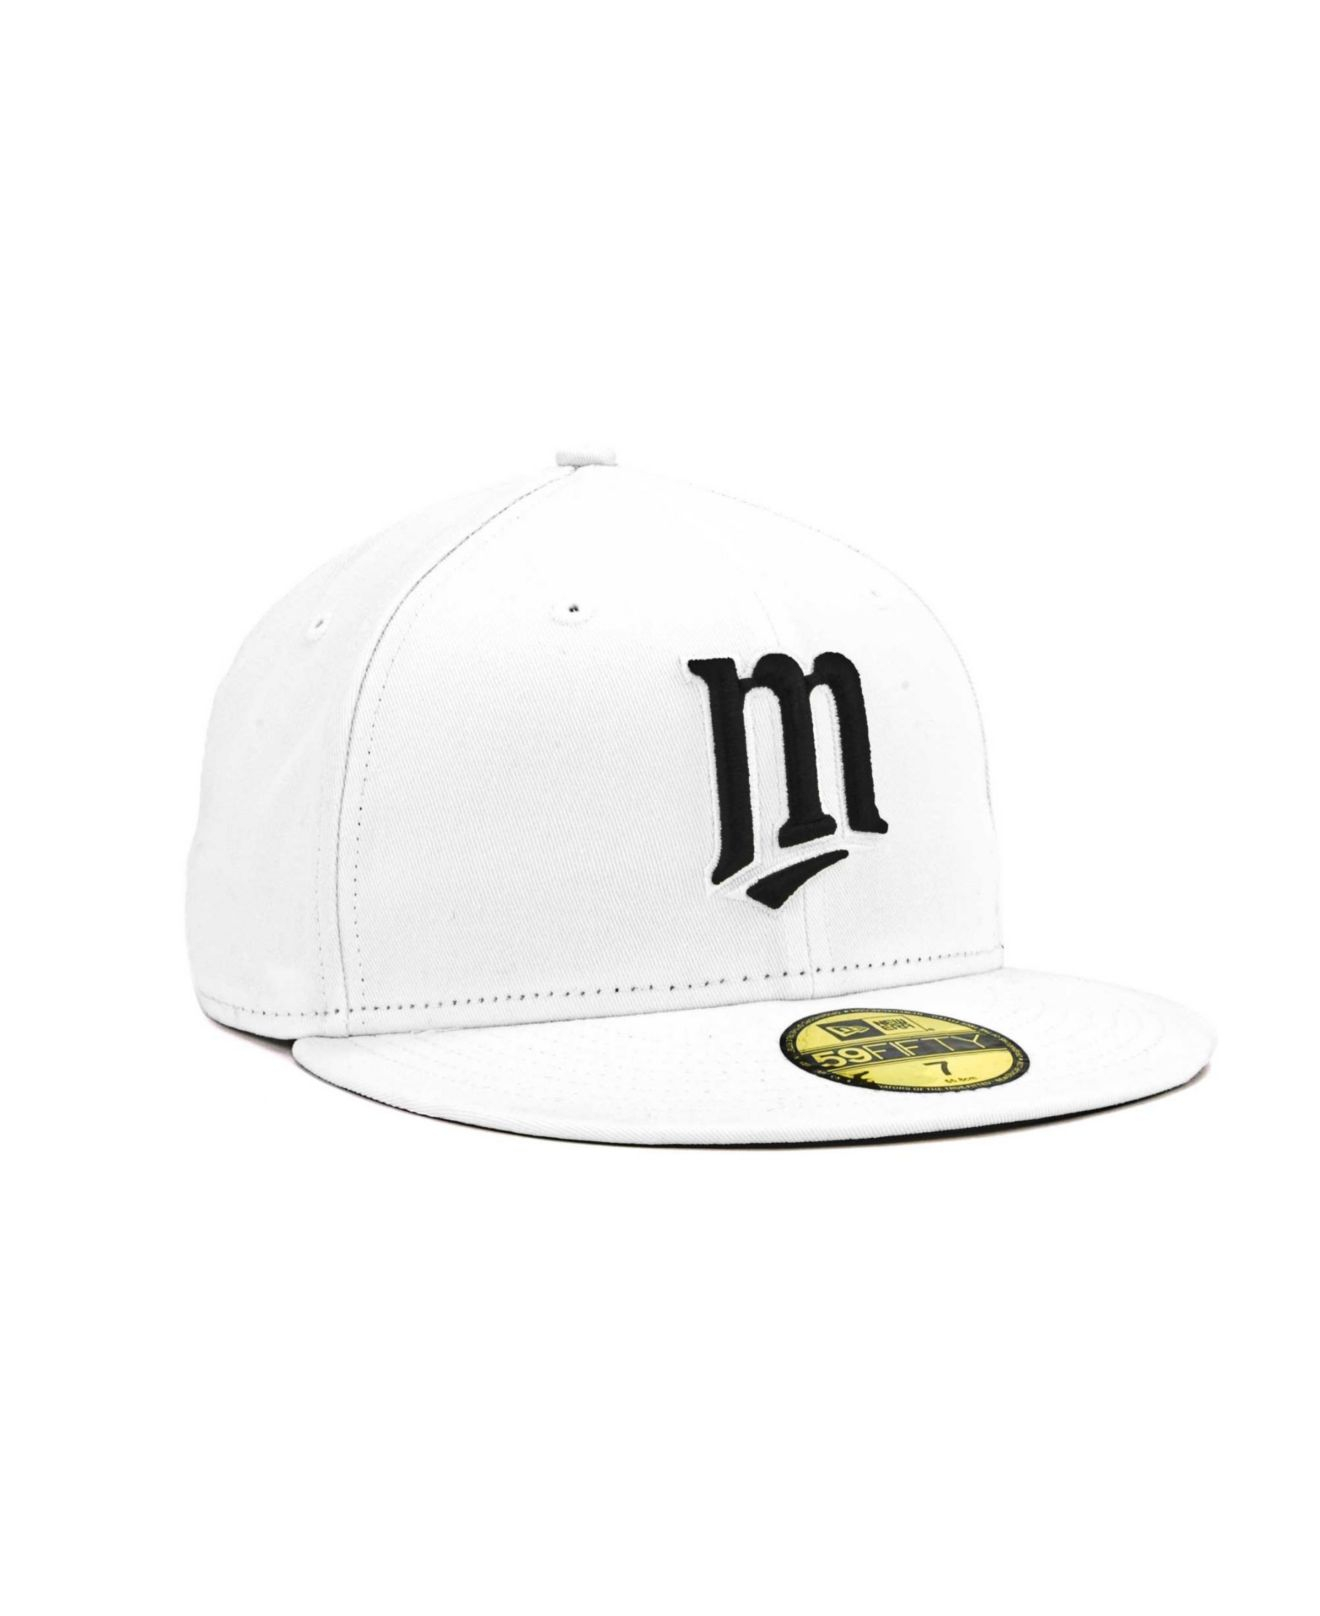 Lyst - Ktz Minnesota Twins Mlb White And Black 59fifty Cap in White ... b2afab3101e1